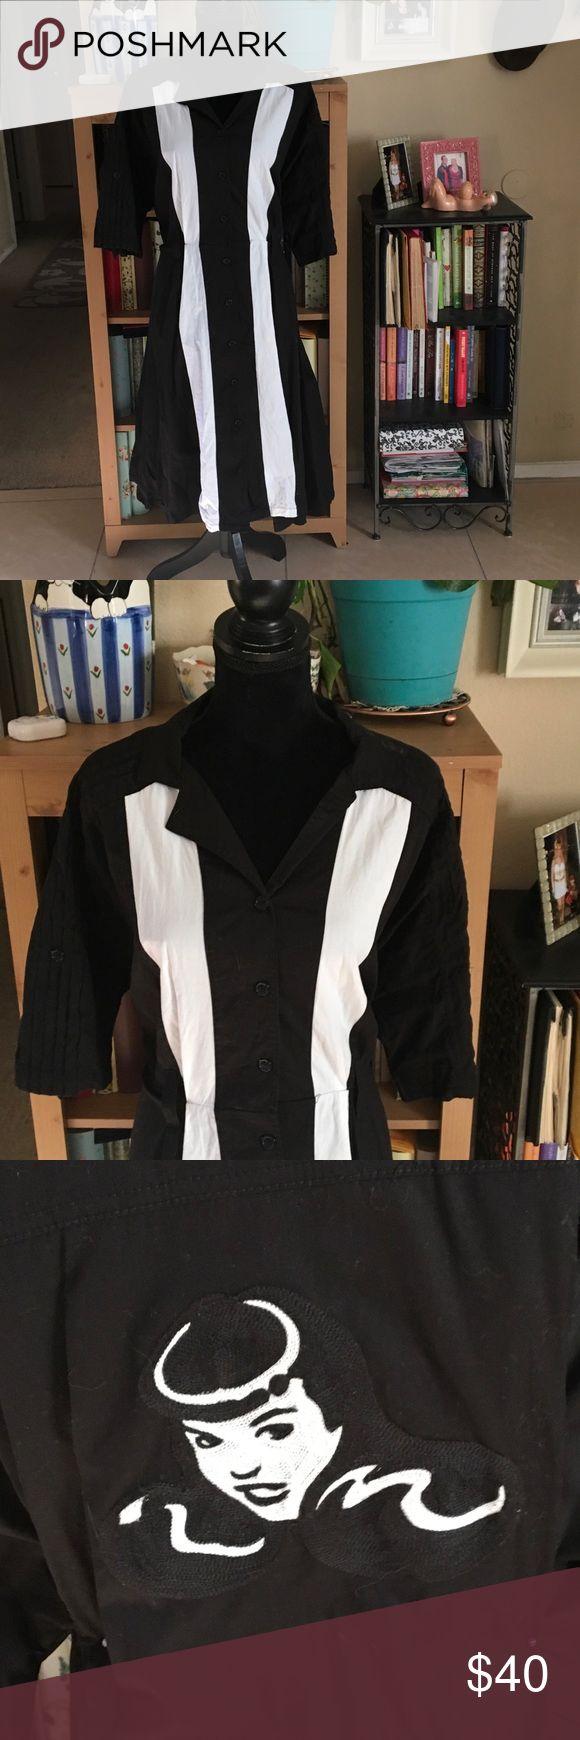 Tatyana Bettie Page bowler dress 👗💋💄 Rockabilly Rockabilly dream!  Rockin' Bettie Page bowling dress from Tatyana.  Size 4XL, which fits more like a 2XL.  In superb condition. Tatyana Dresses Midi